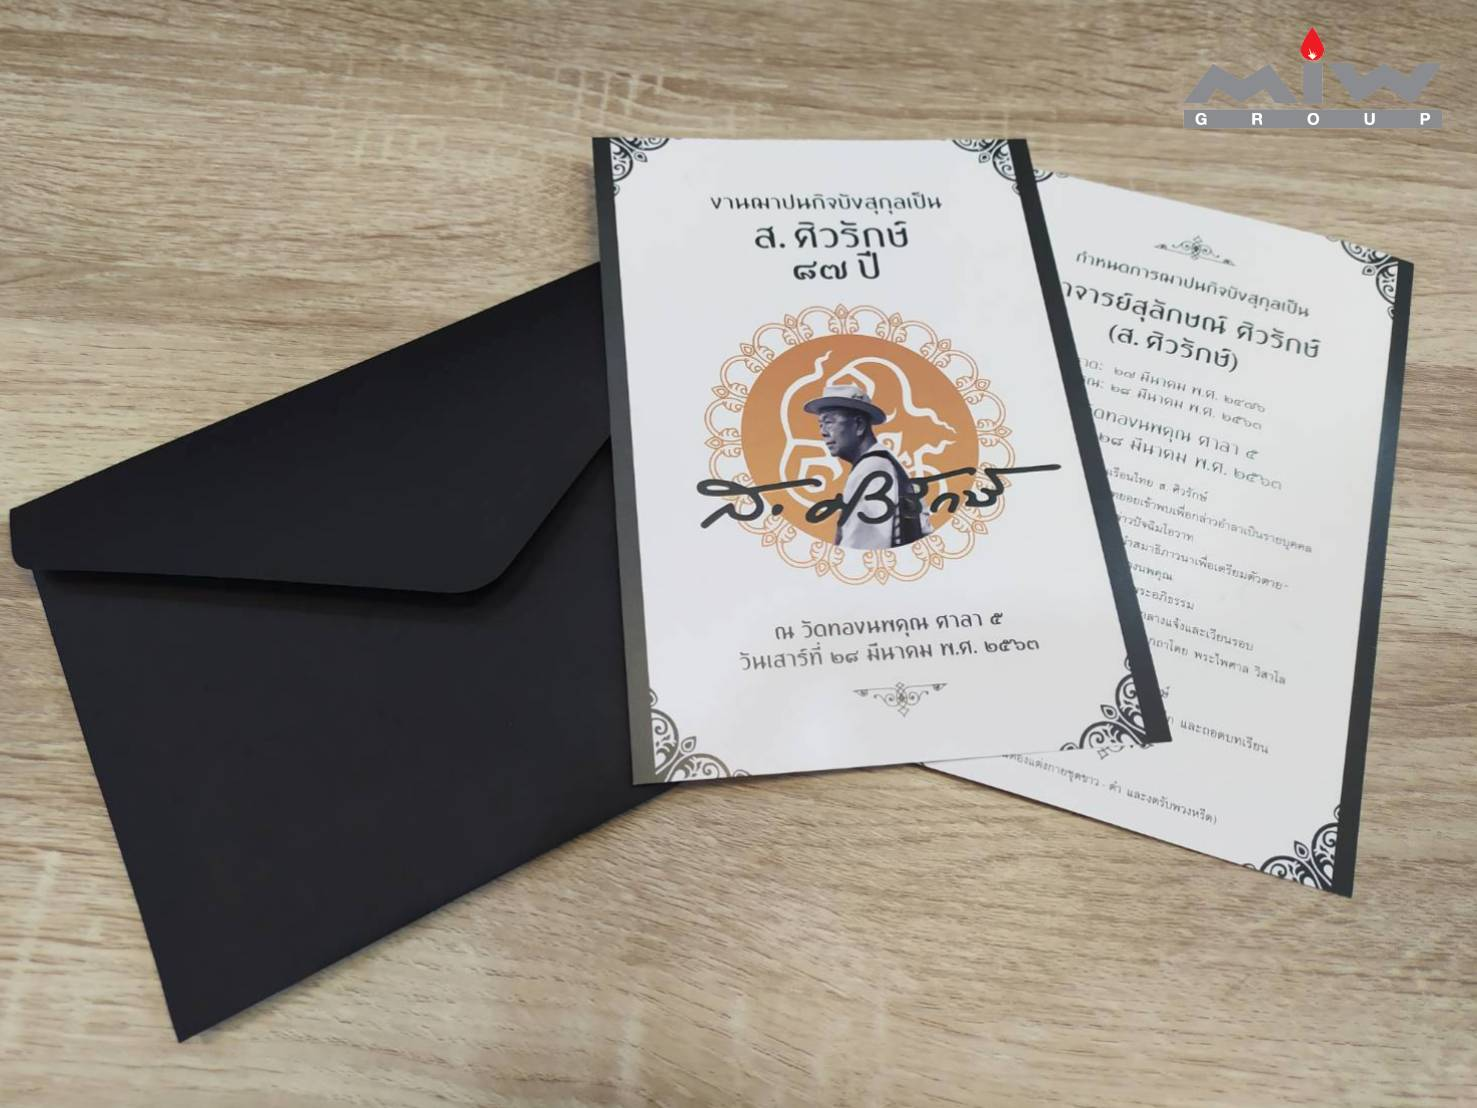 Invitation card 24 - การ์ดเชิญ (Invitation card)